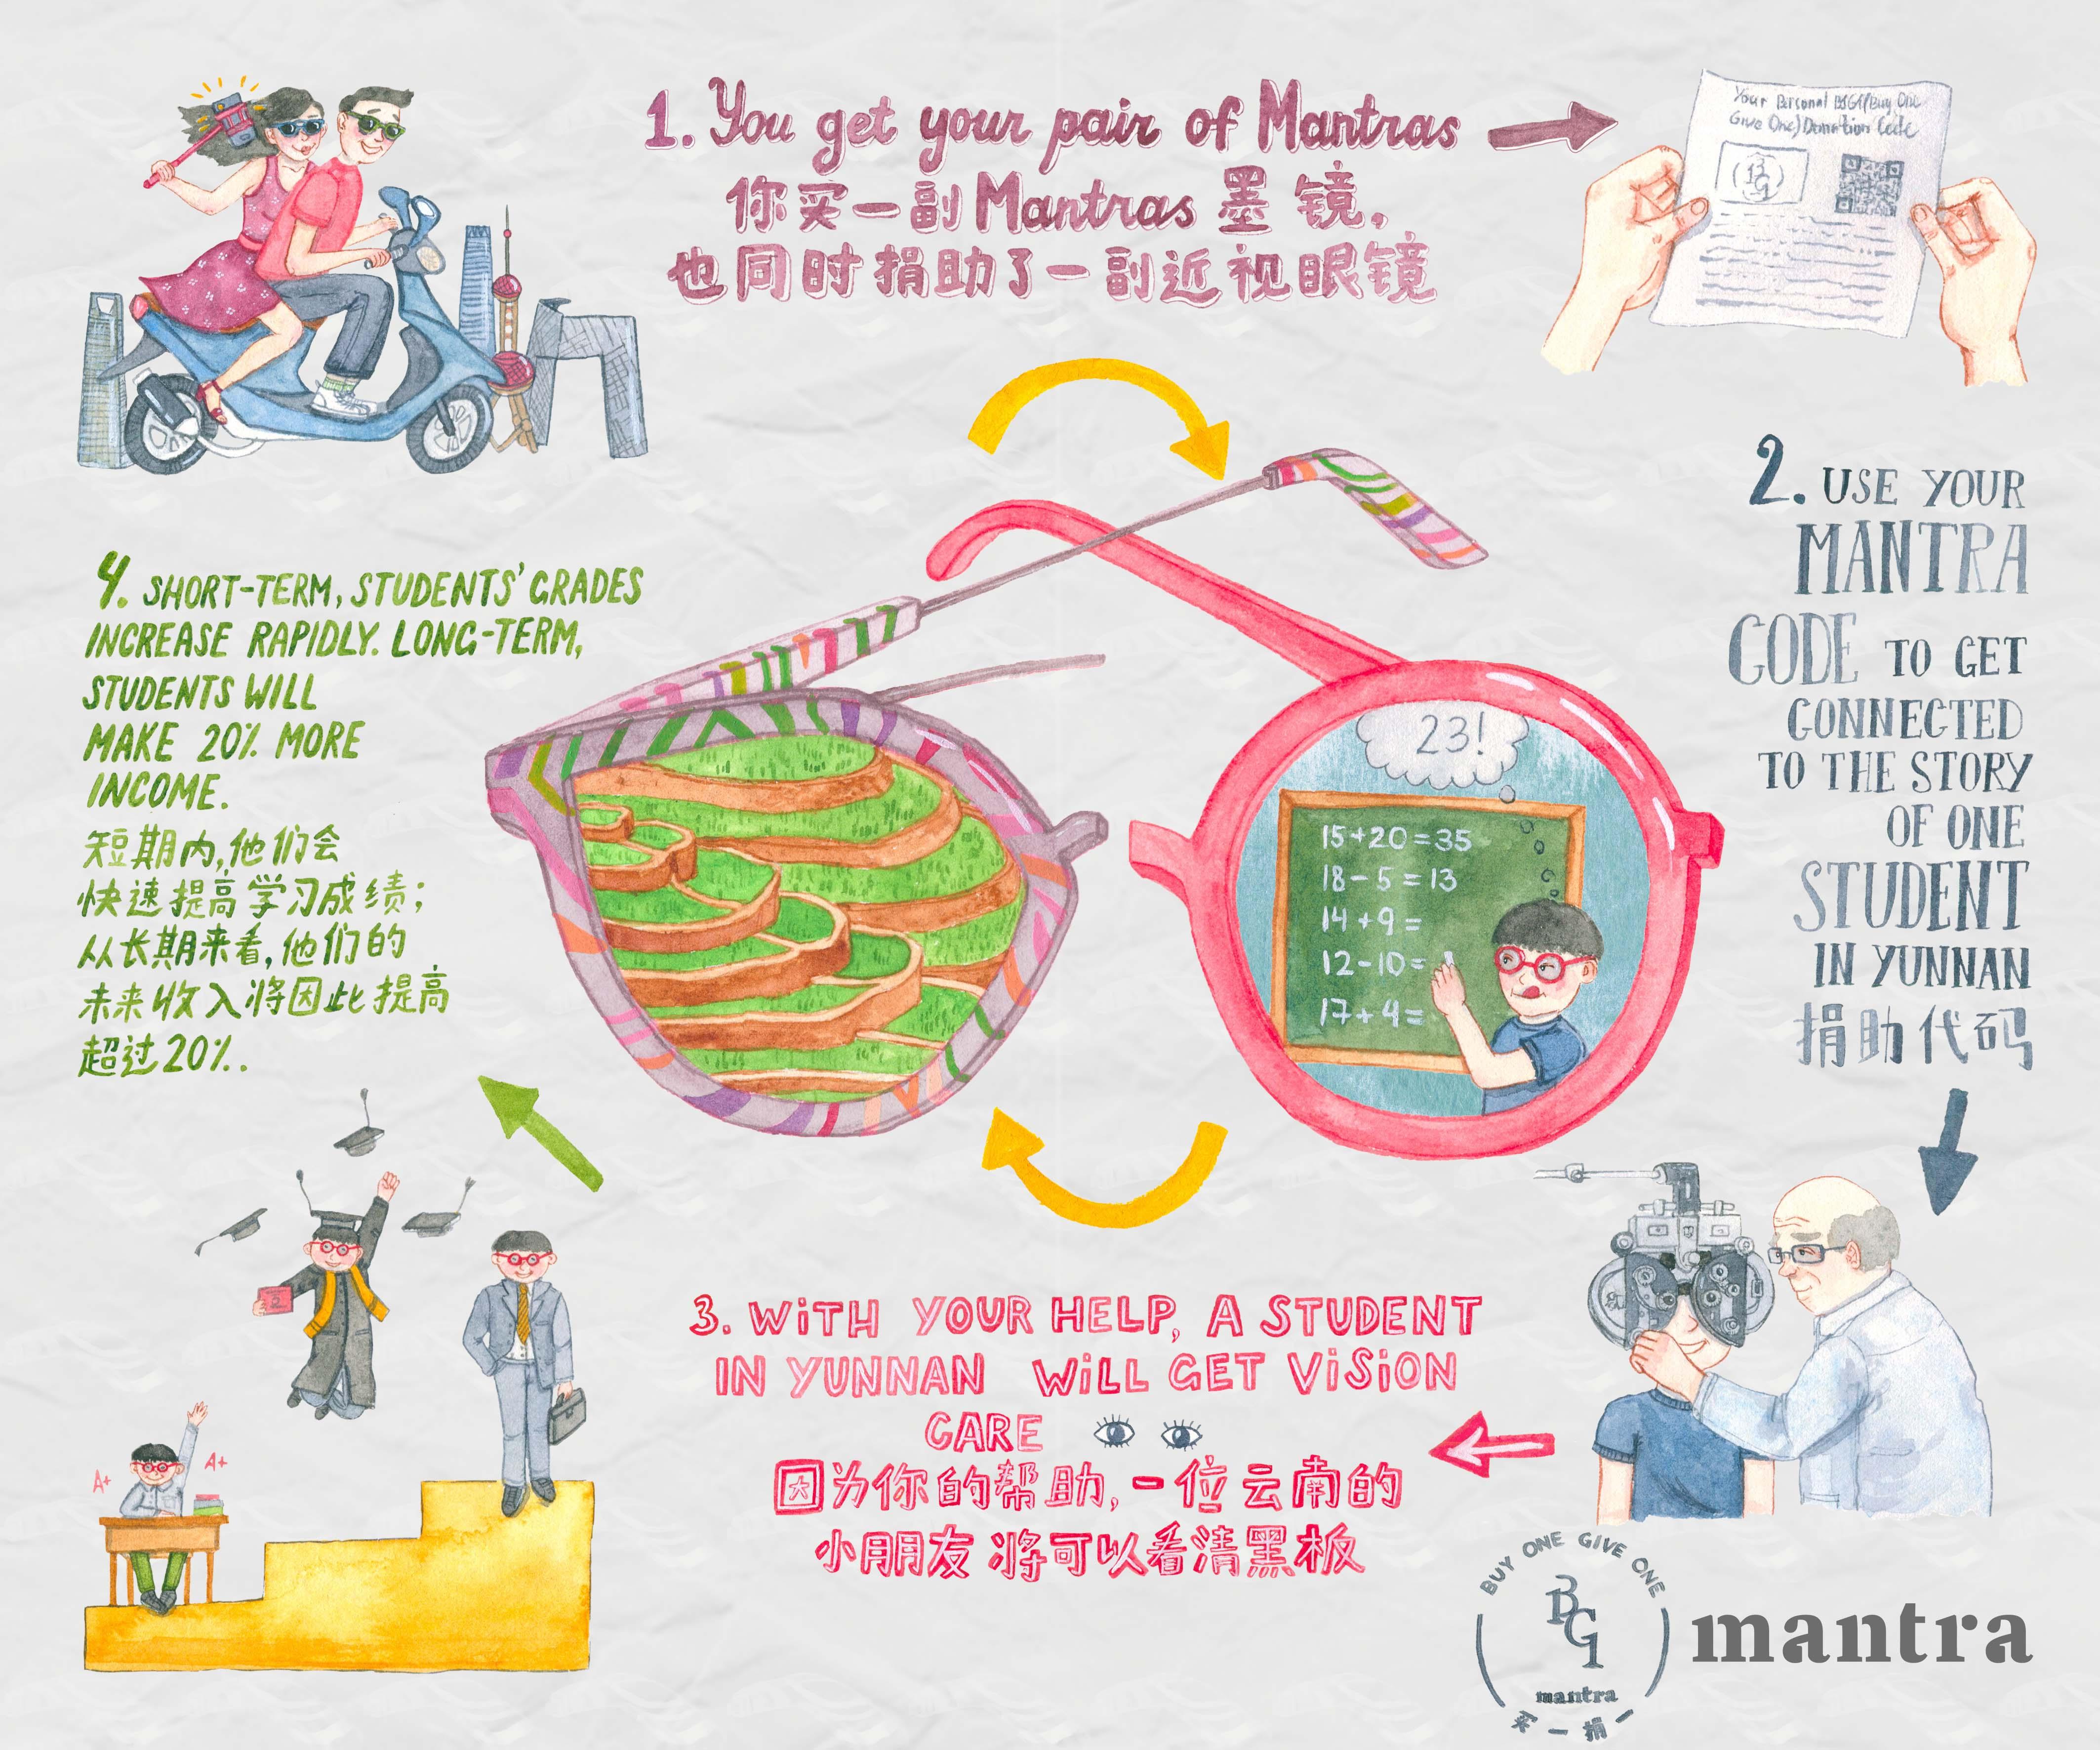 Liuba Draws Infographic